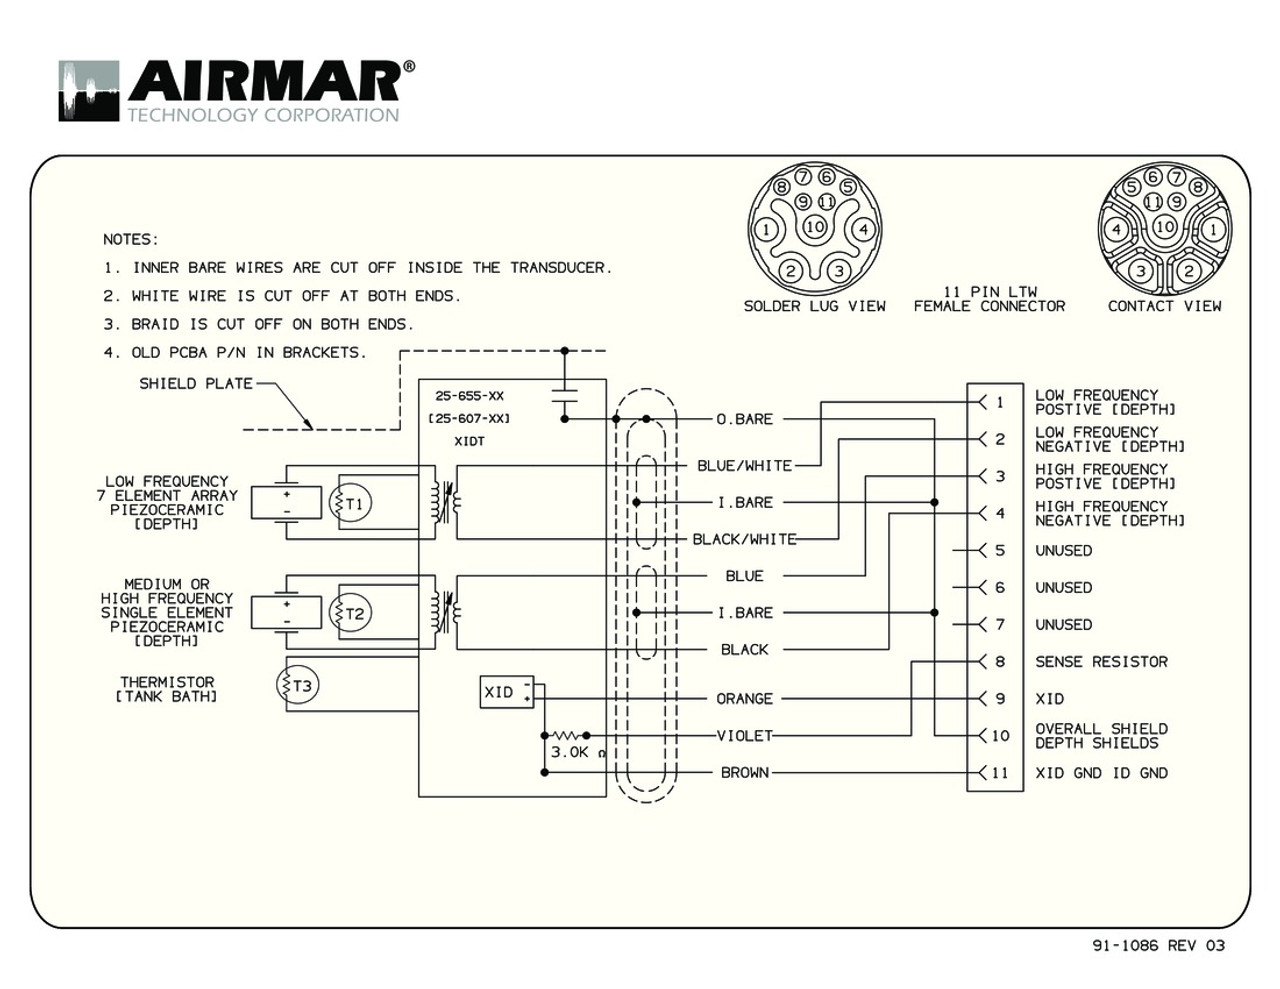 ice cream truck wiring diagram, pickup wiring diagram, fire truck wiring diagram, on a hot rod wiring diagram